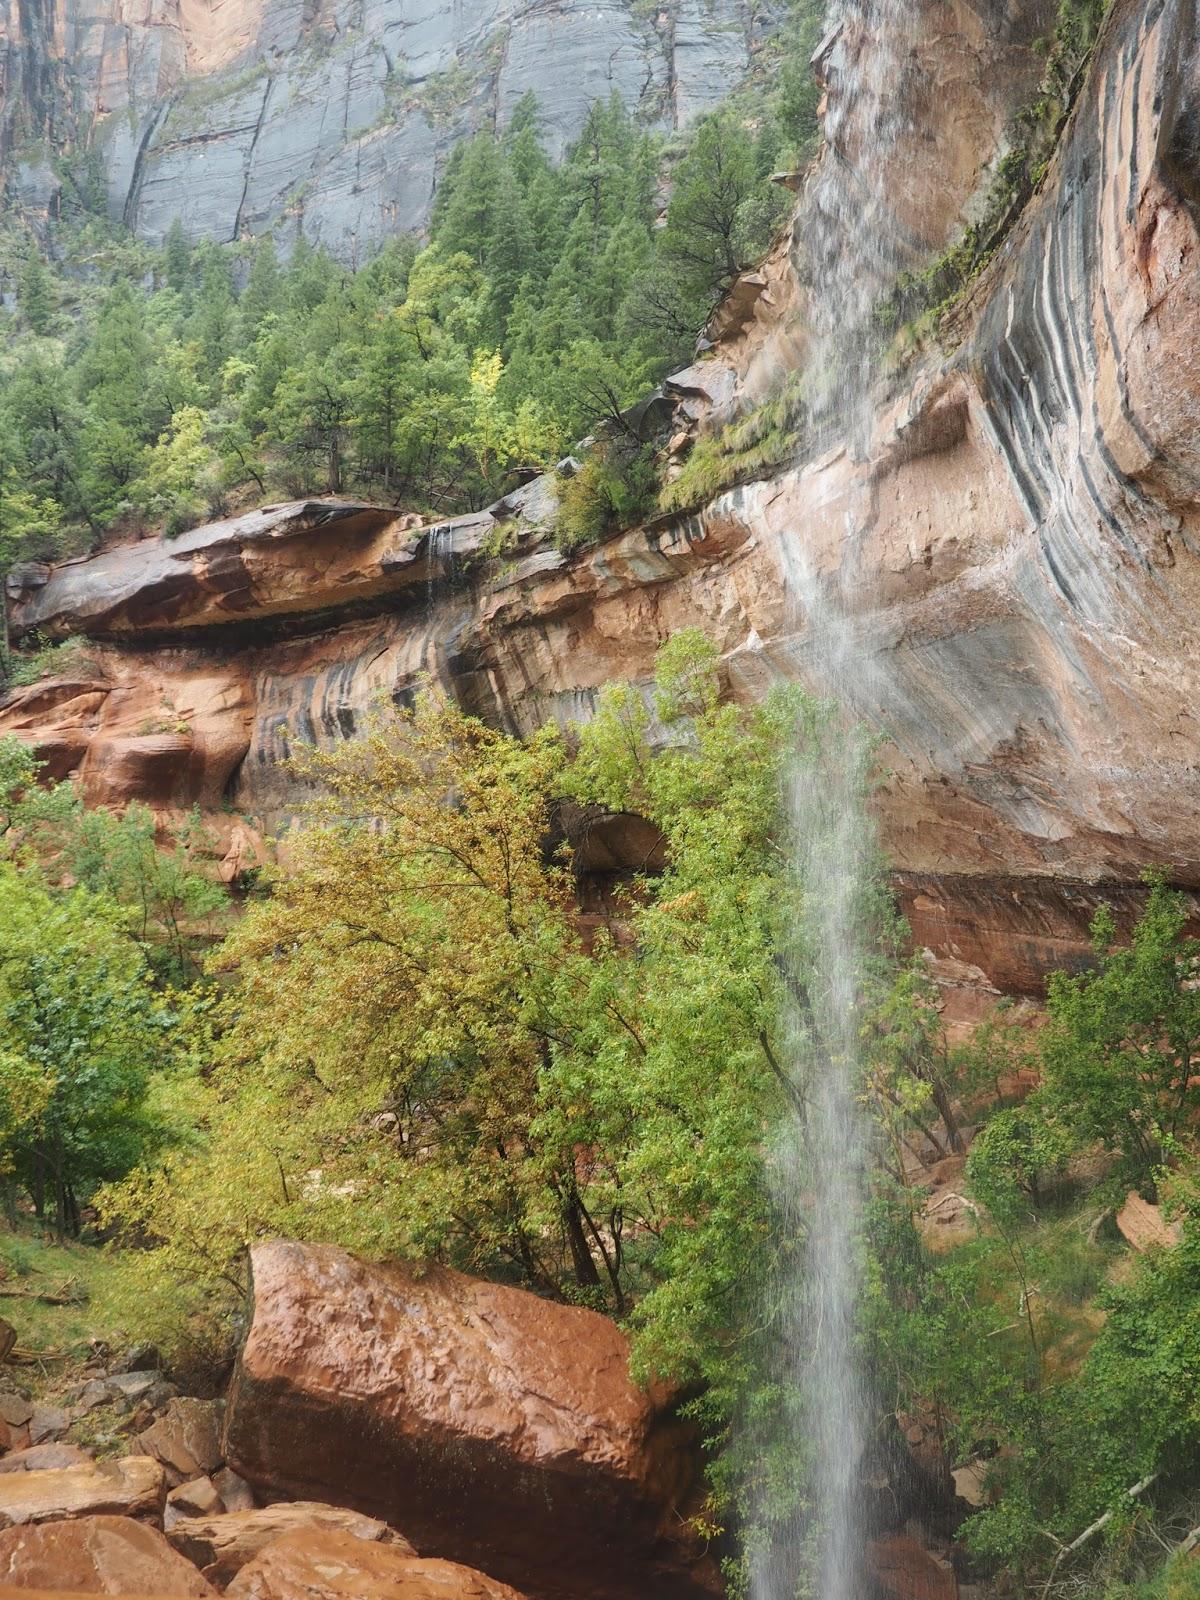 Waterfall in Zion National Park, Utah